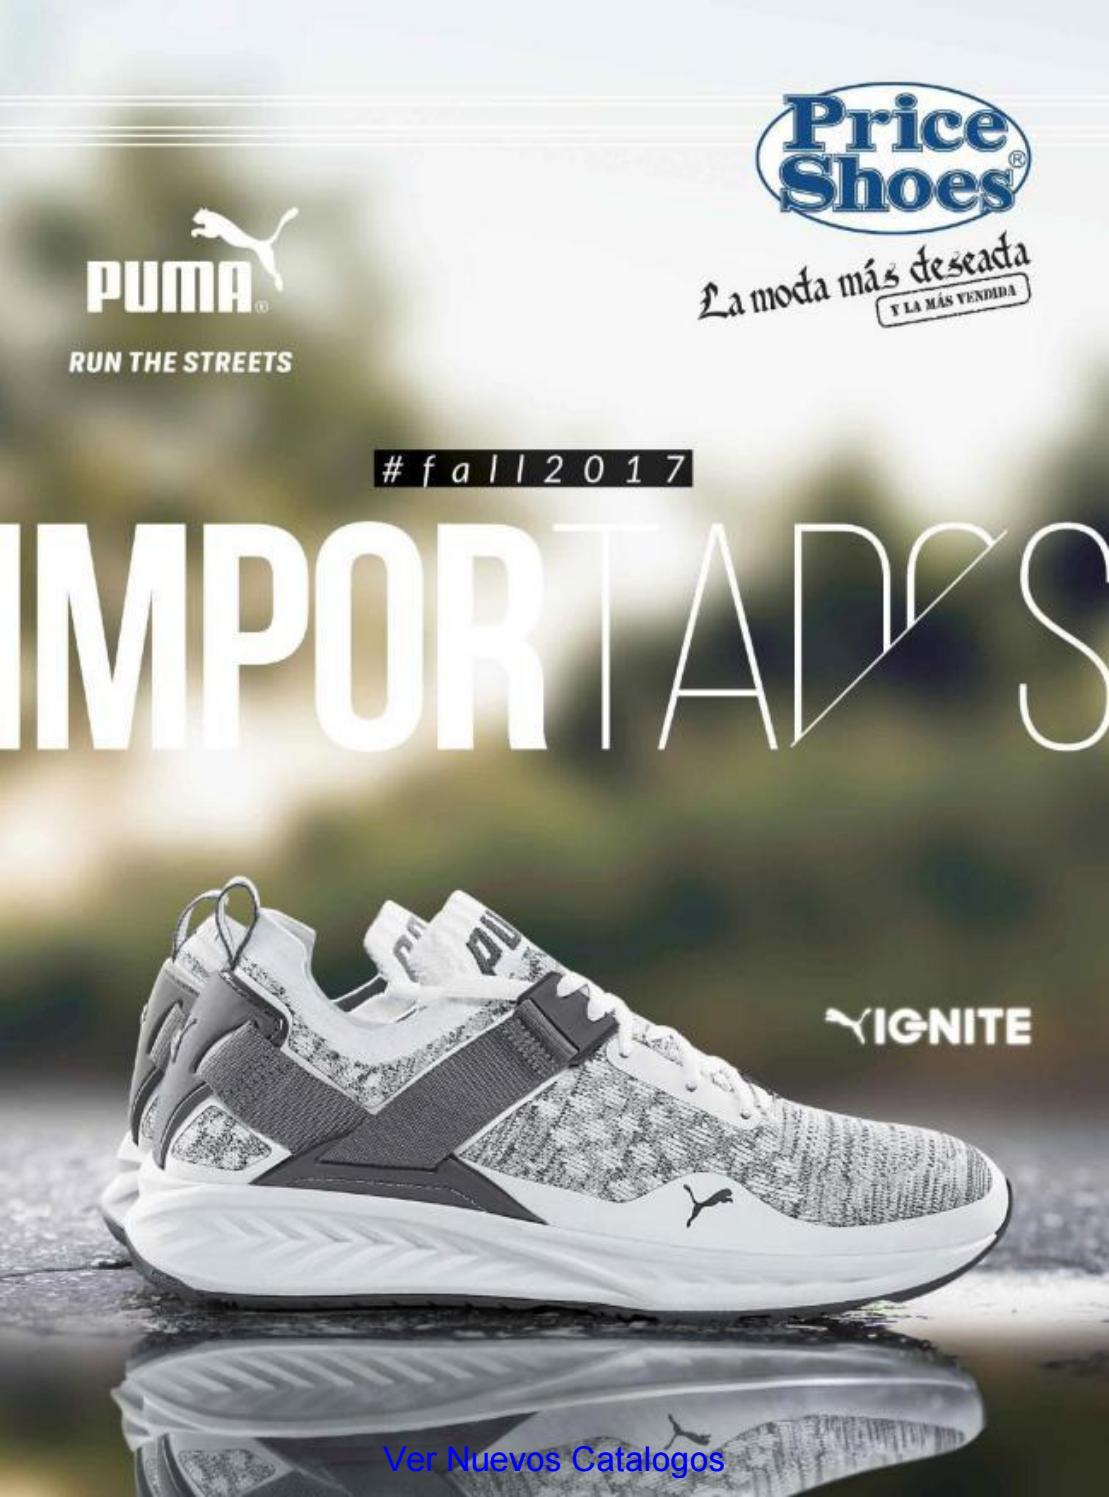 c158bb2c Importados fall price shoes 2017 by catalogos de mexico - issuu